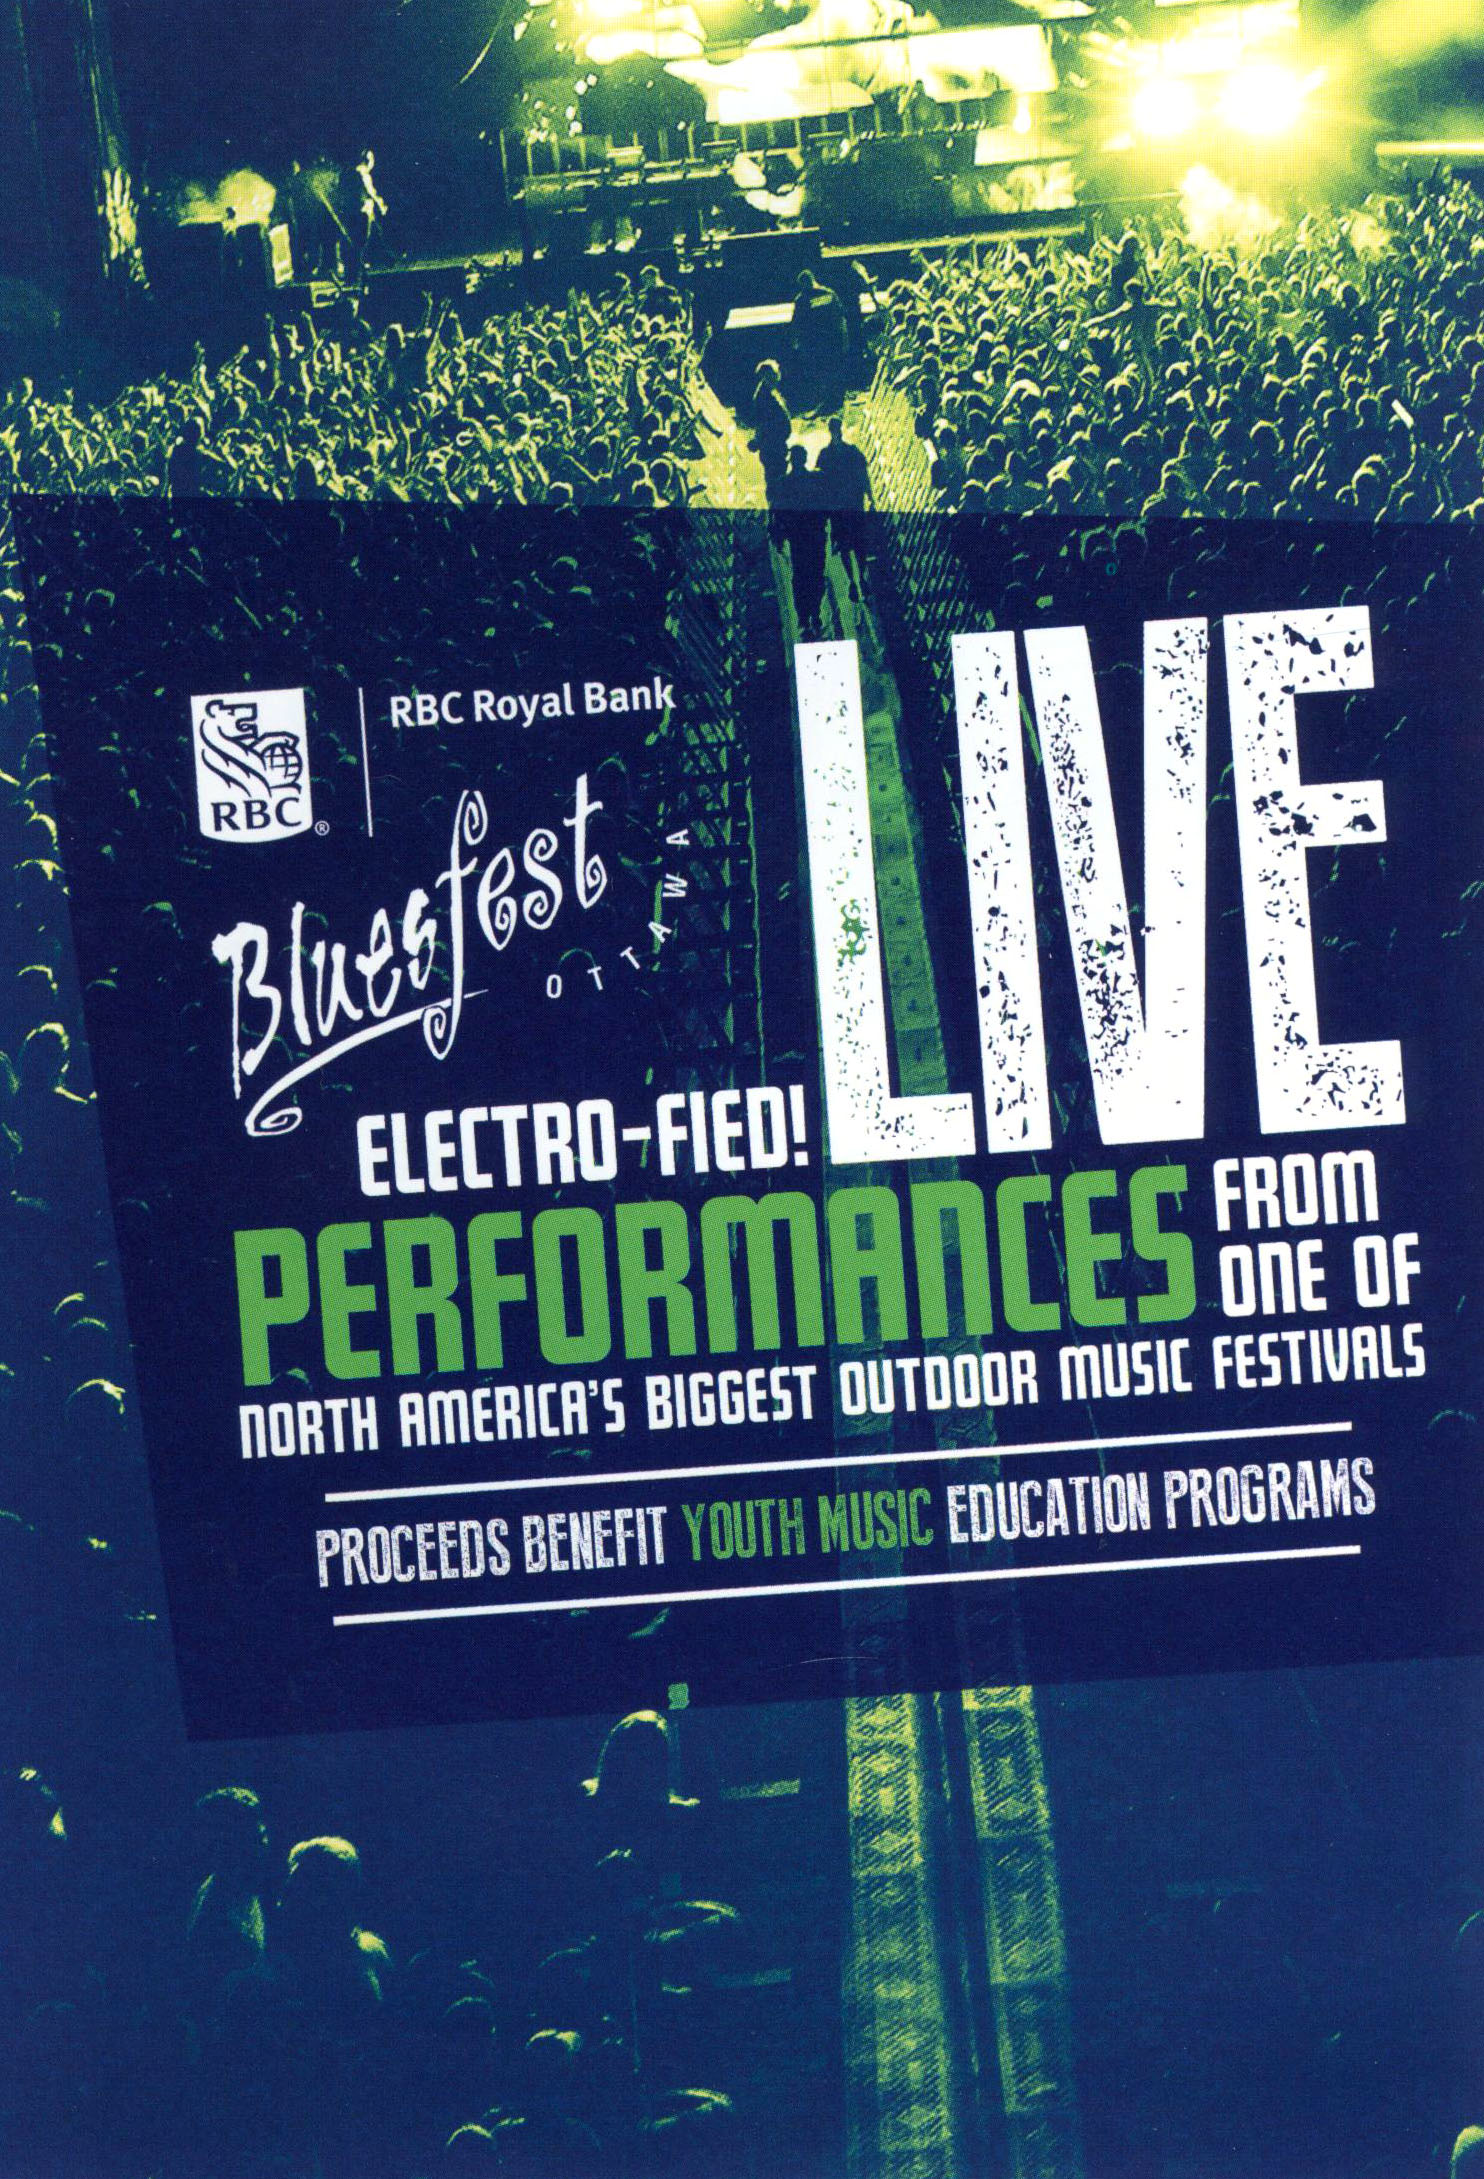 RBC Bluesfest Ottawa: Electro-fied! Live